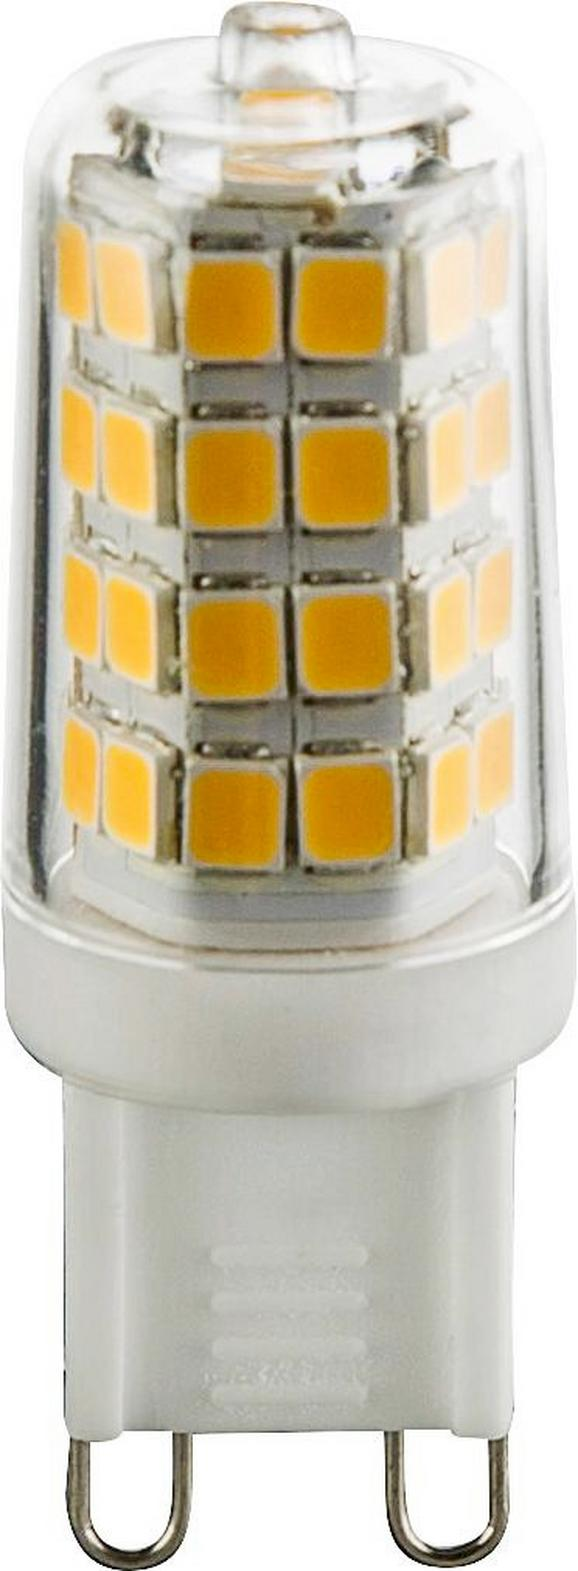 LED-Leuchtmittel 10676, 3 Watt - Transparent, Kunststoff (1,5/5,5/cm)